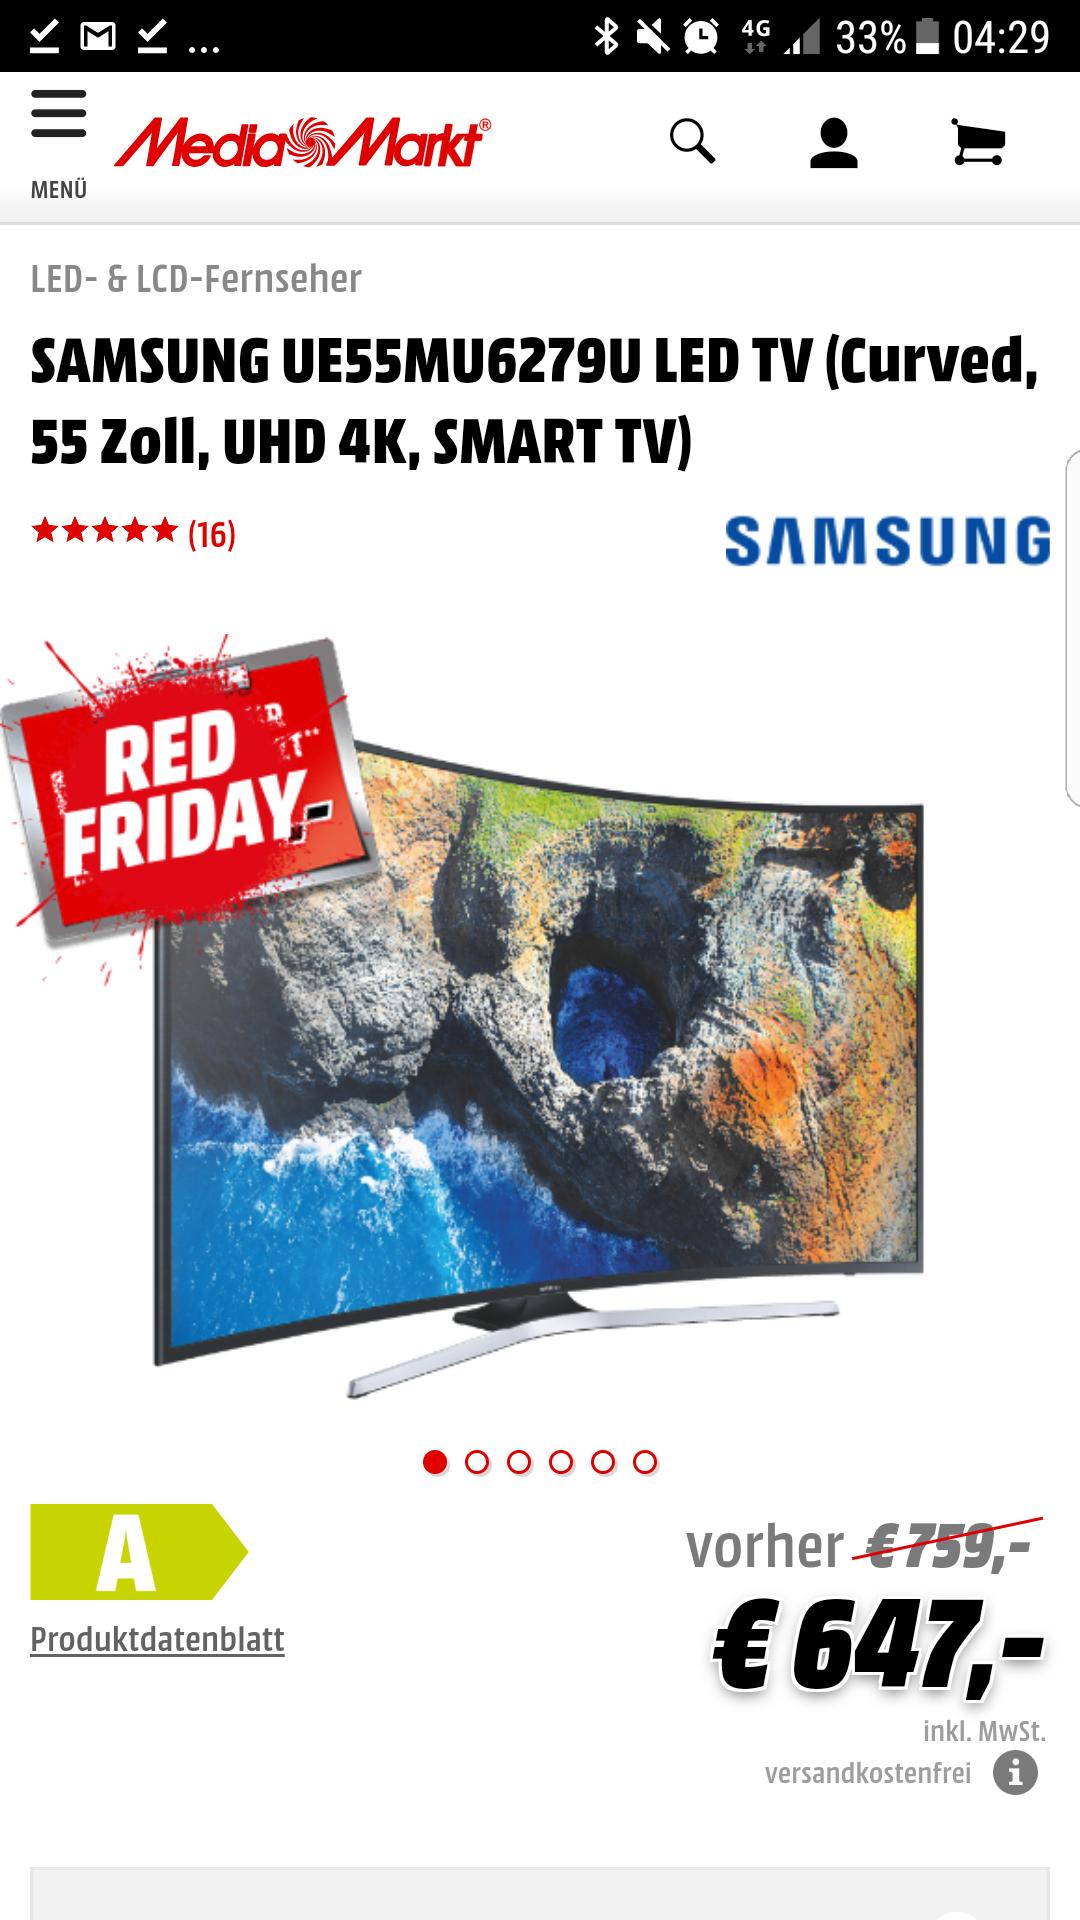 SAMSUNG UE55MU6279U LED TV (Curved, 55 Zoll, UHD 4K, SMART TV)